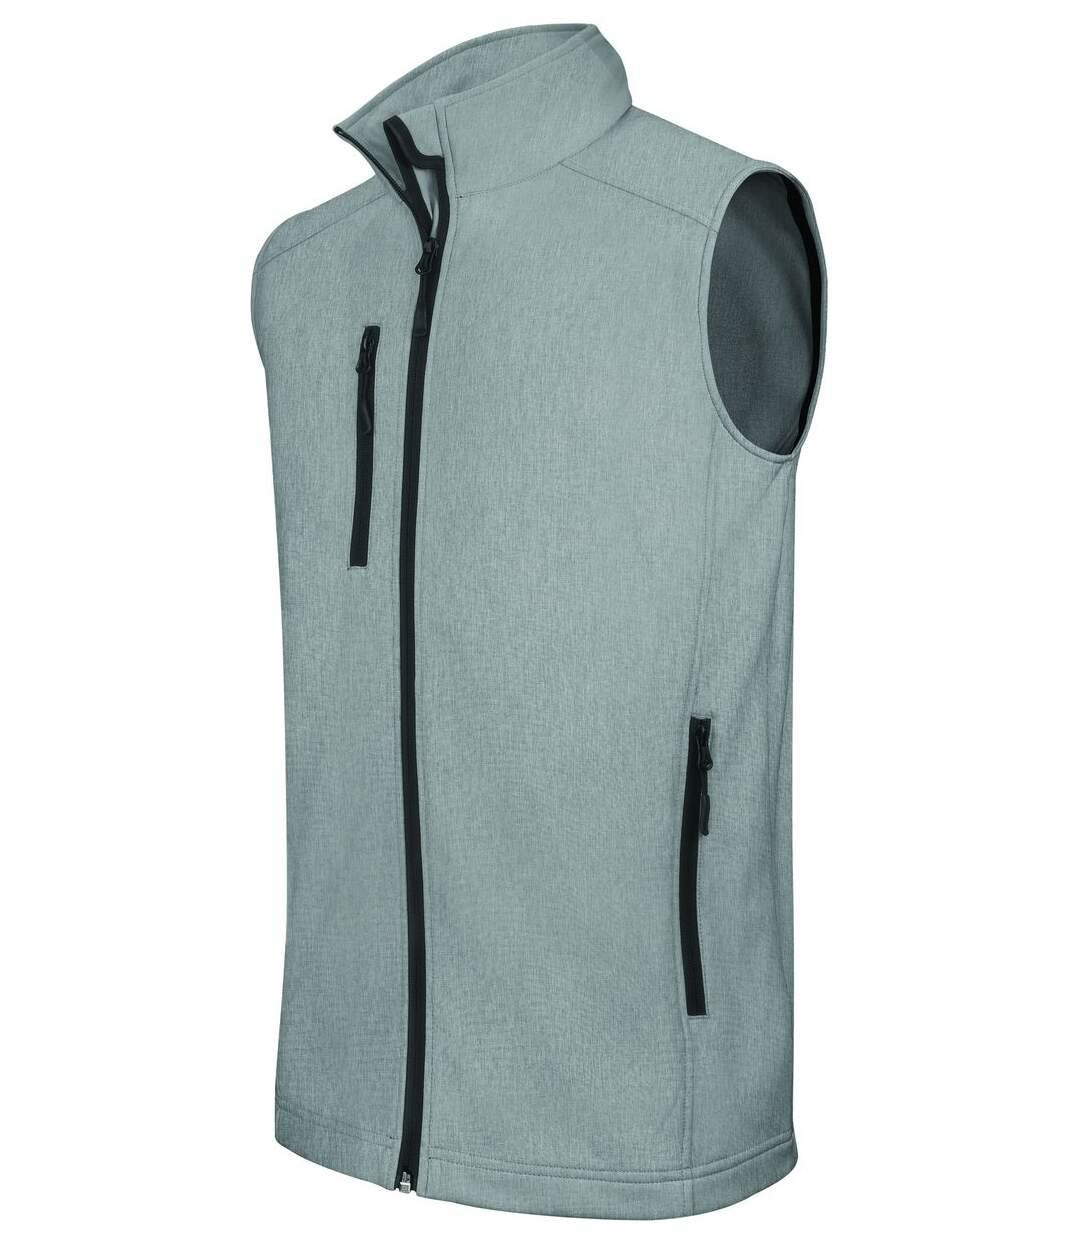 Bodywarmer softshell - gilet sans manches - K403 - gris merle - Homme